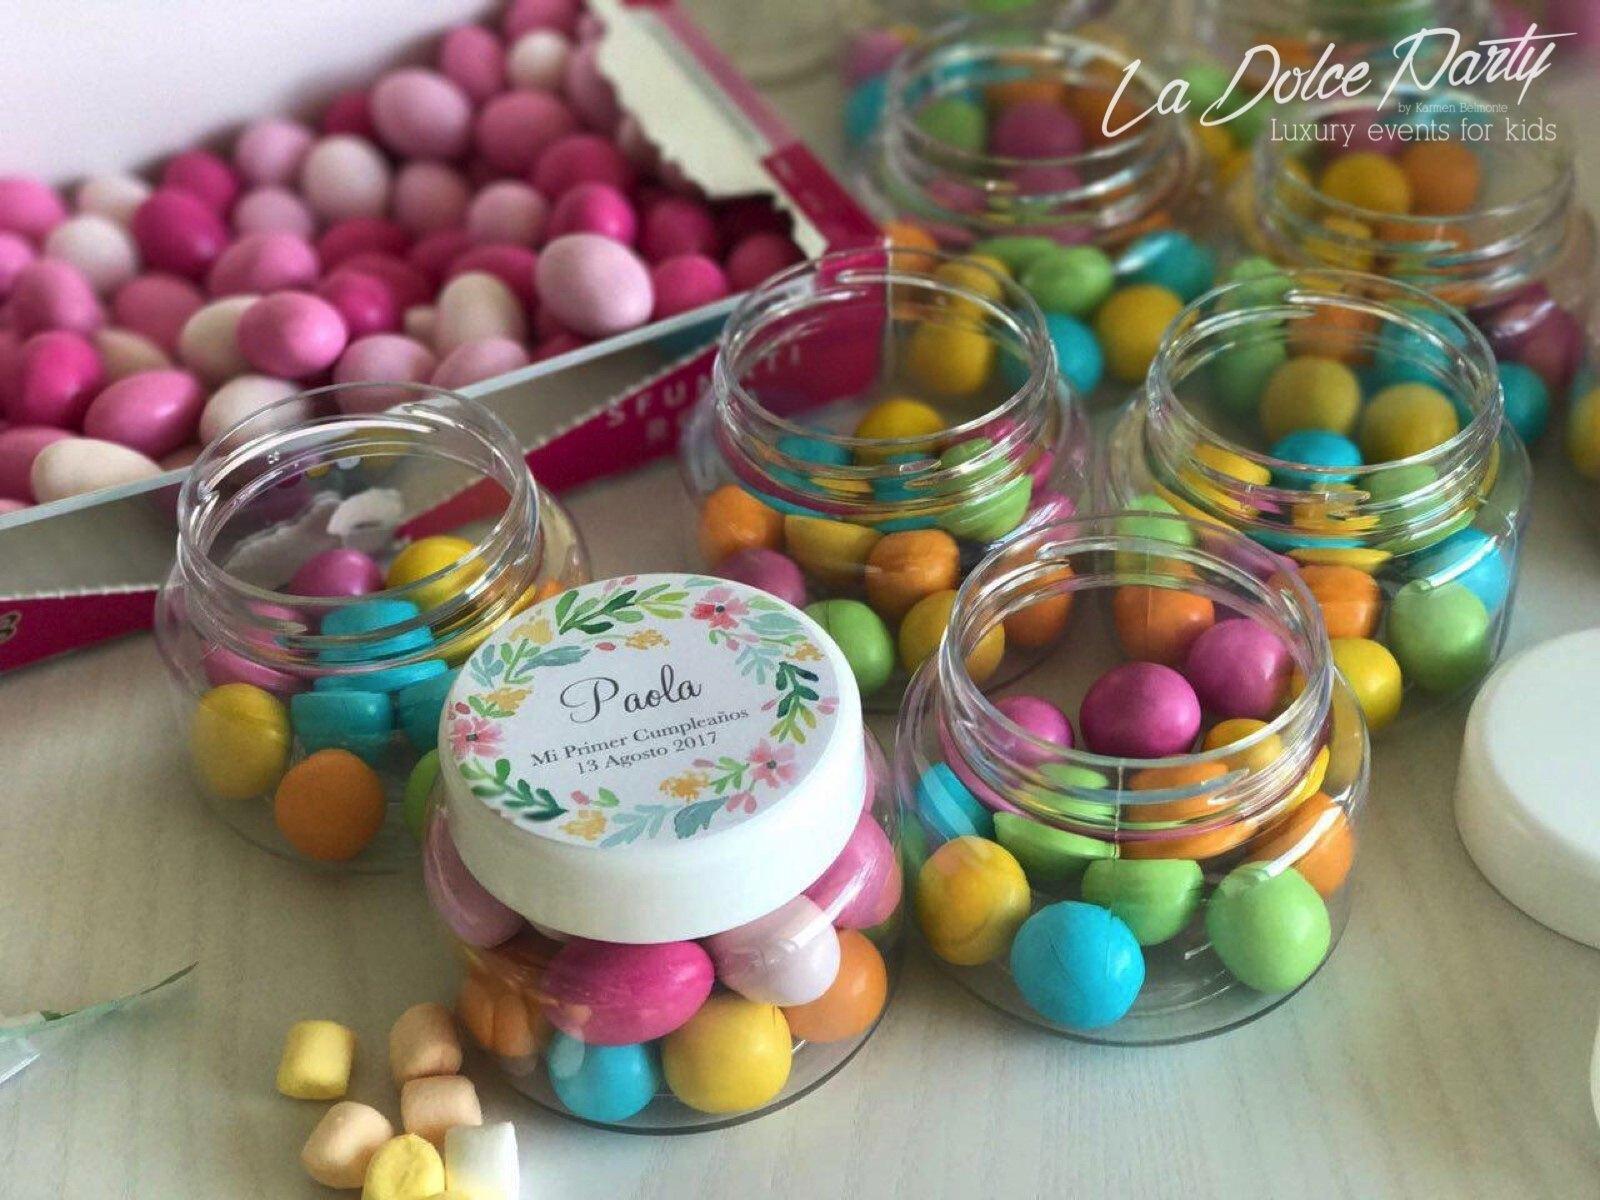 Chuches Gourmet Como Detalles Para Invitados La Dolce Party ~ Detalles Con Fotos Para Regalar